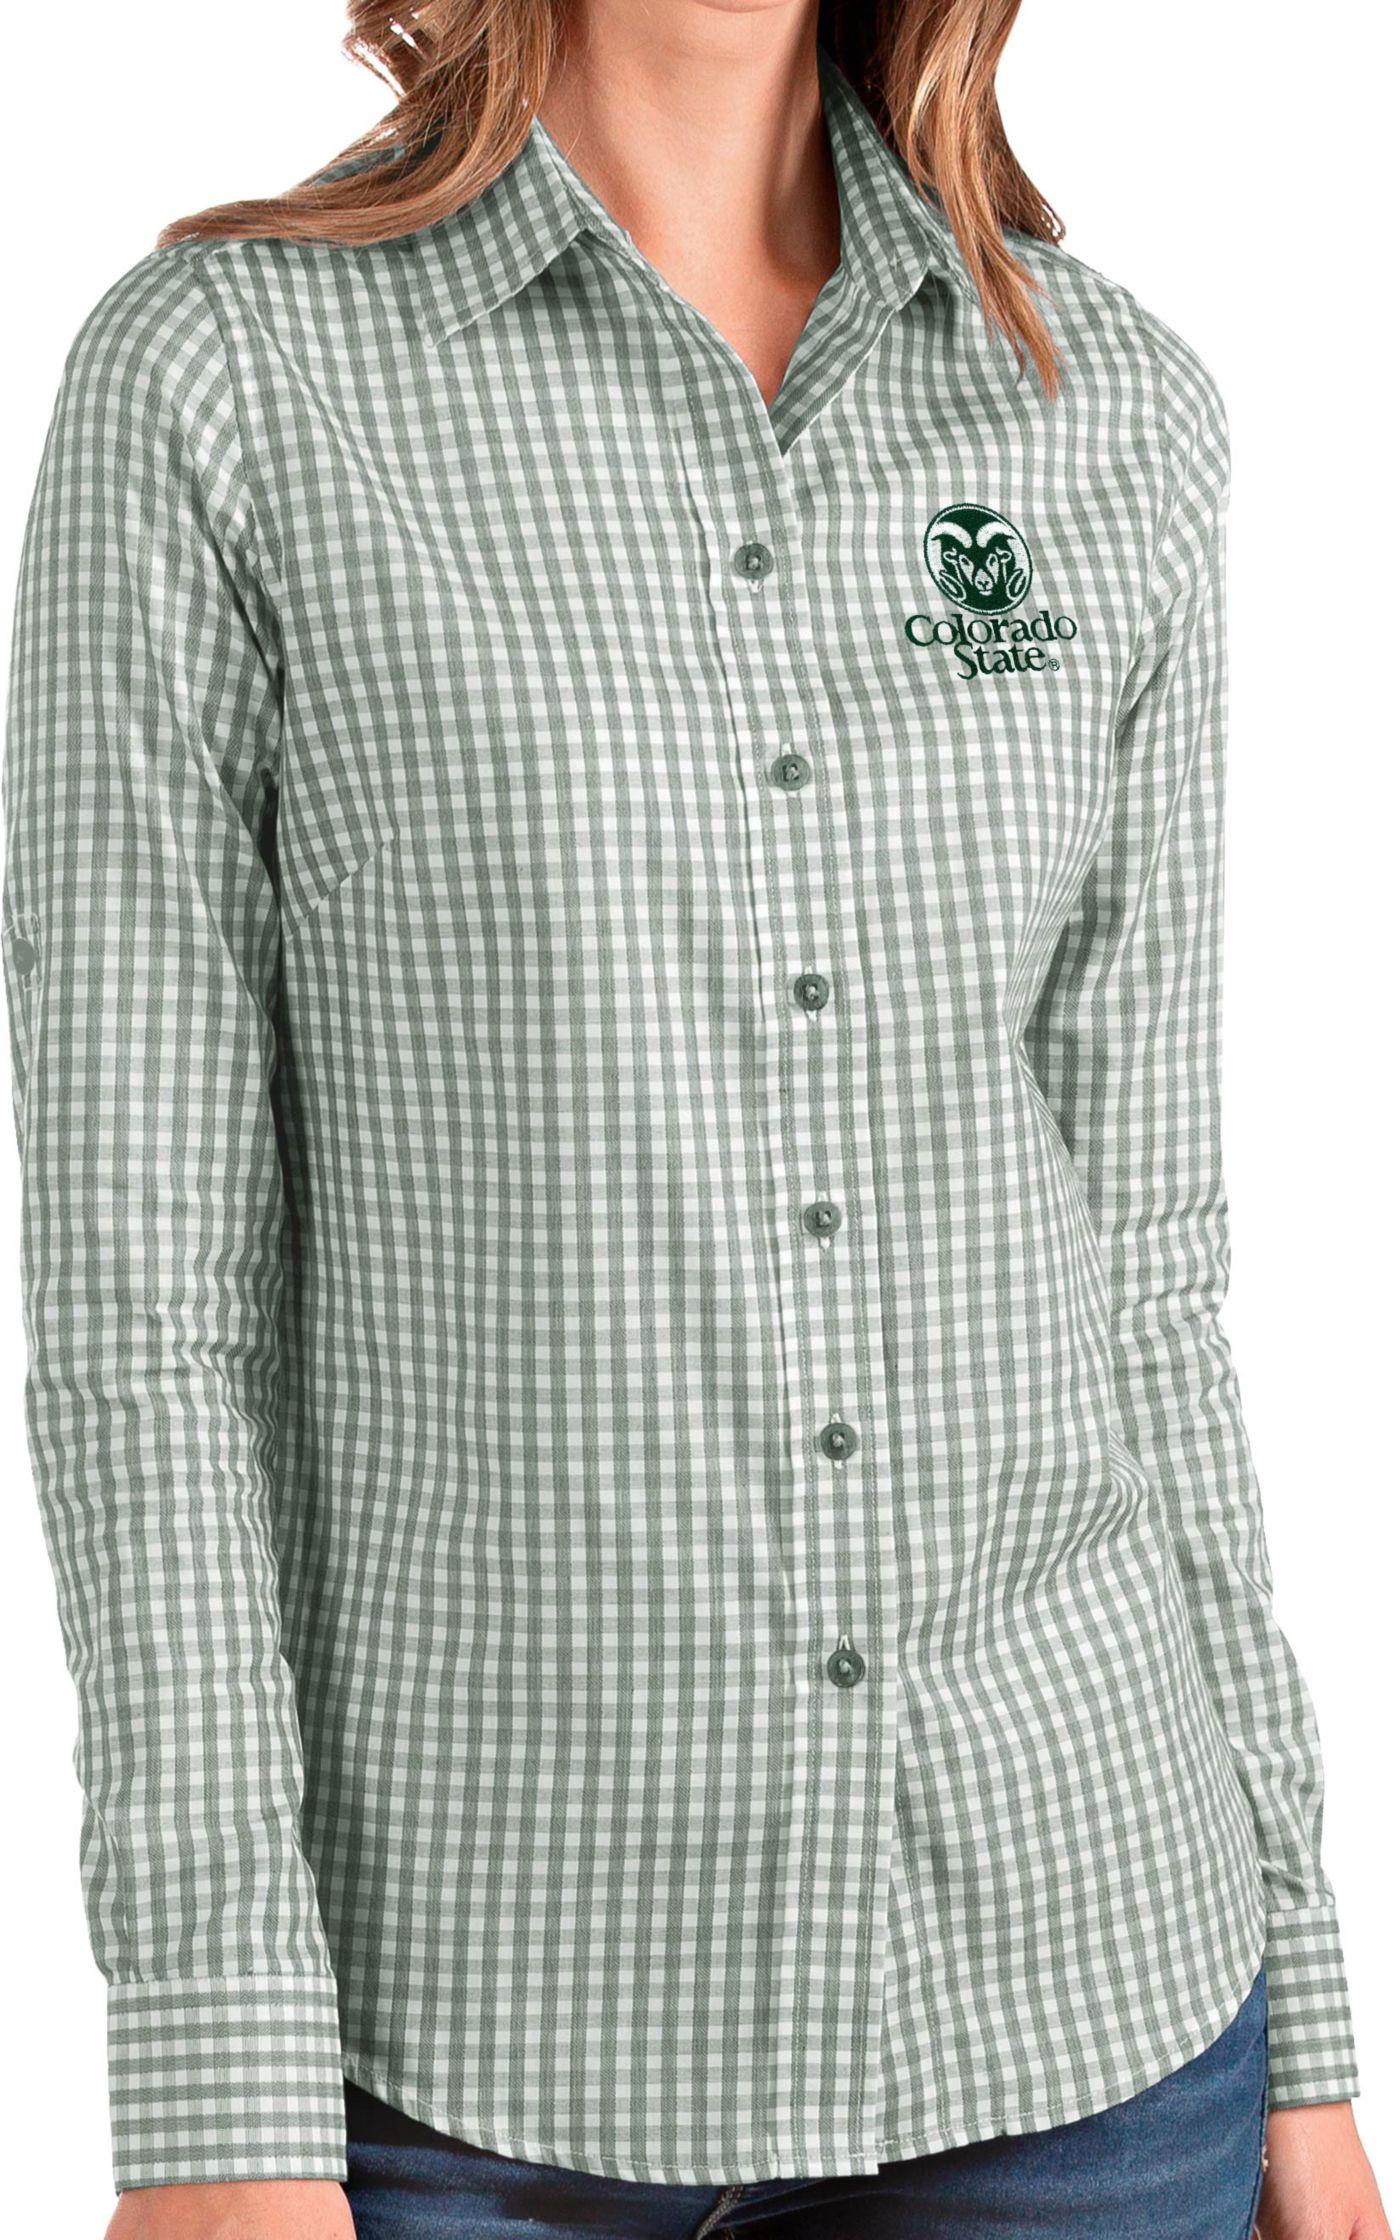 Antigua Women's Colorado State Rams Green Structure Button Down Long Sleeve Shirt